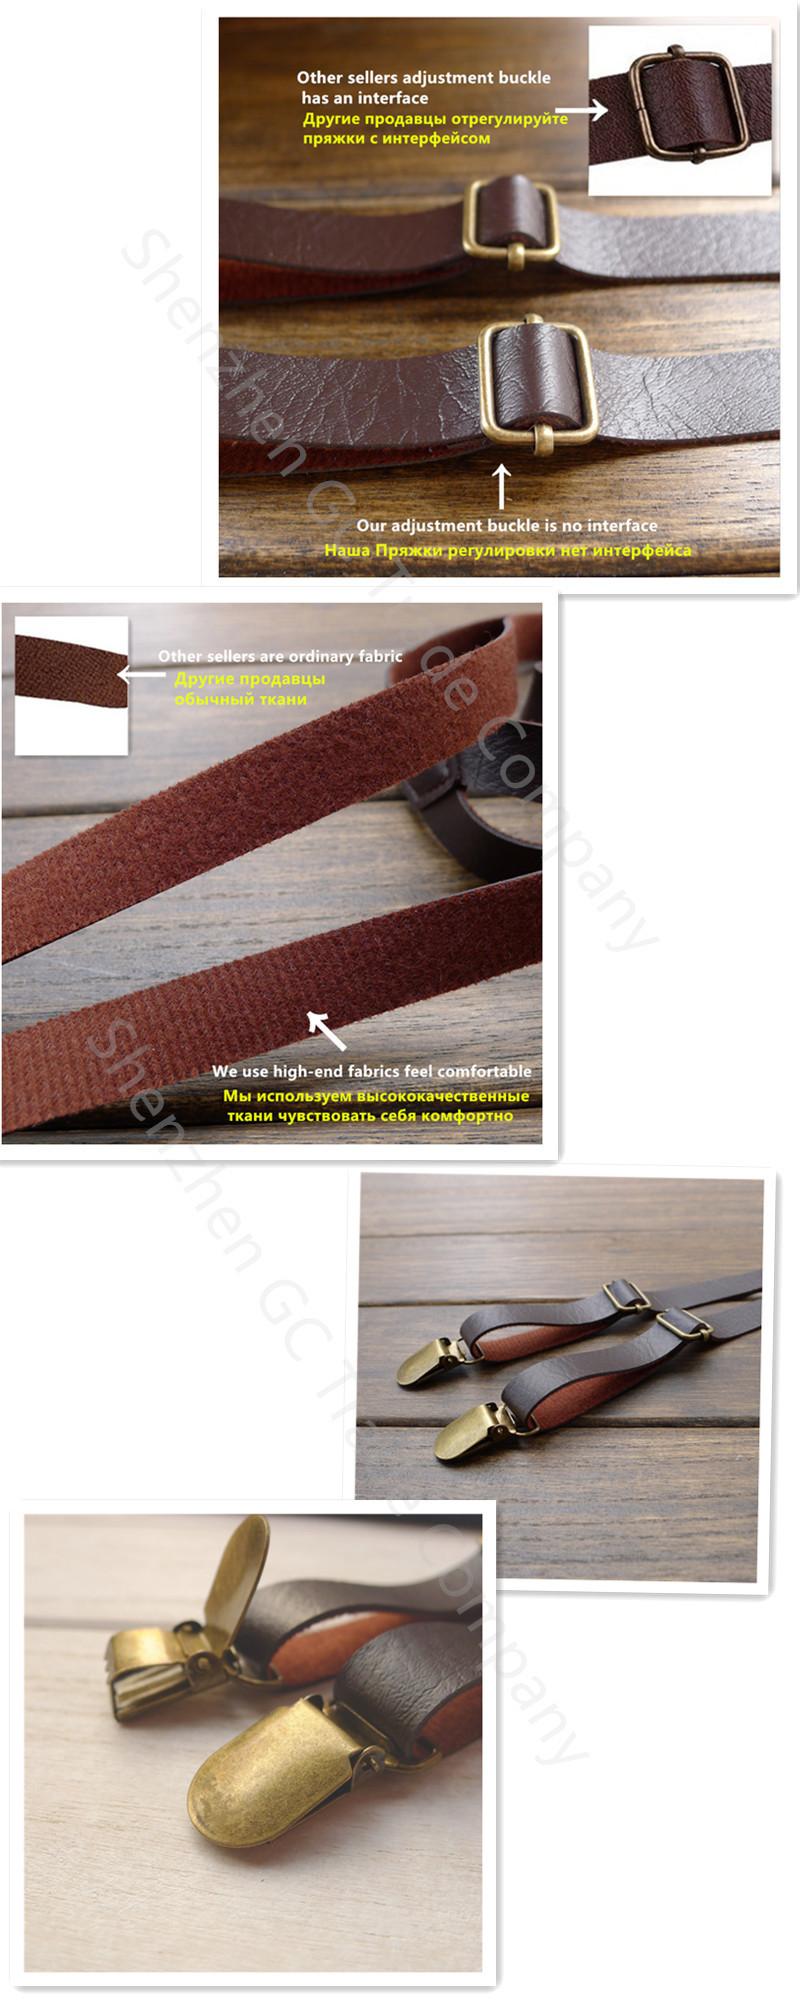 retro leather strap leather suspenders clip braces men general  england cloТонкийg  recessionista suspenders for men and Женщины